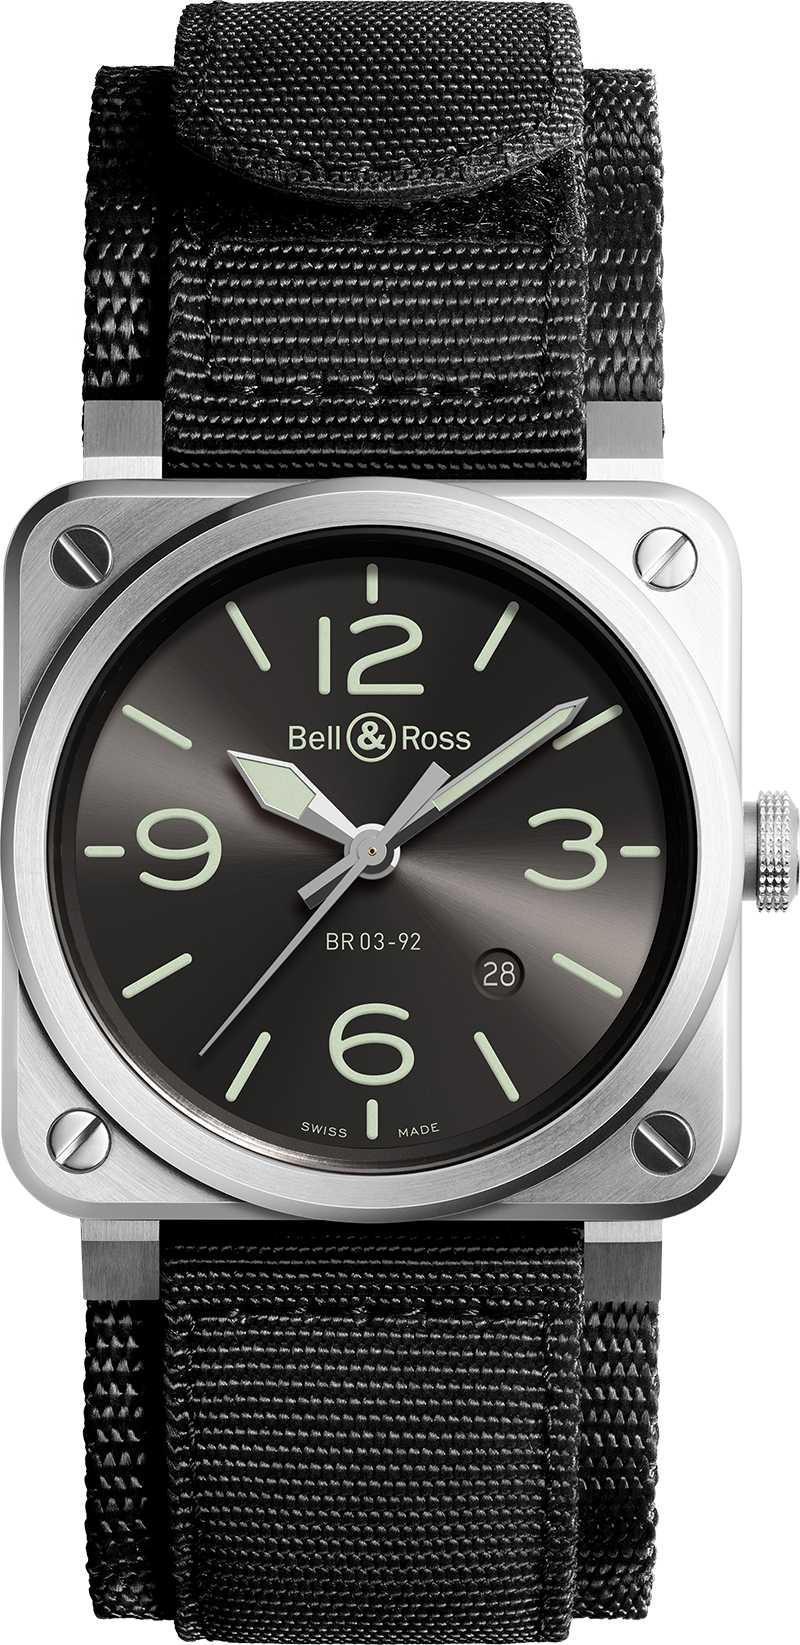 Bell & Ross「BR03-92 GREY LUM」腕錶,超彈黑色合成織物╱111,600元(圖╱Bell & Ross提供)